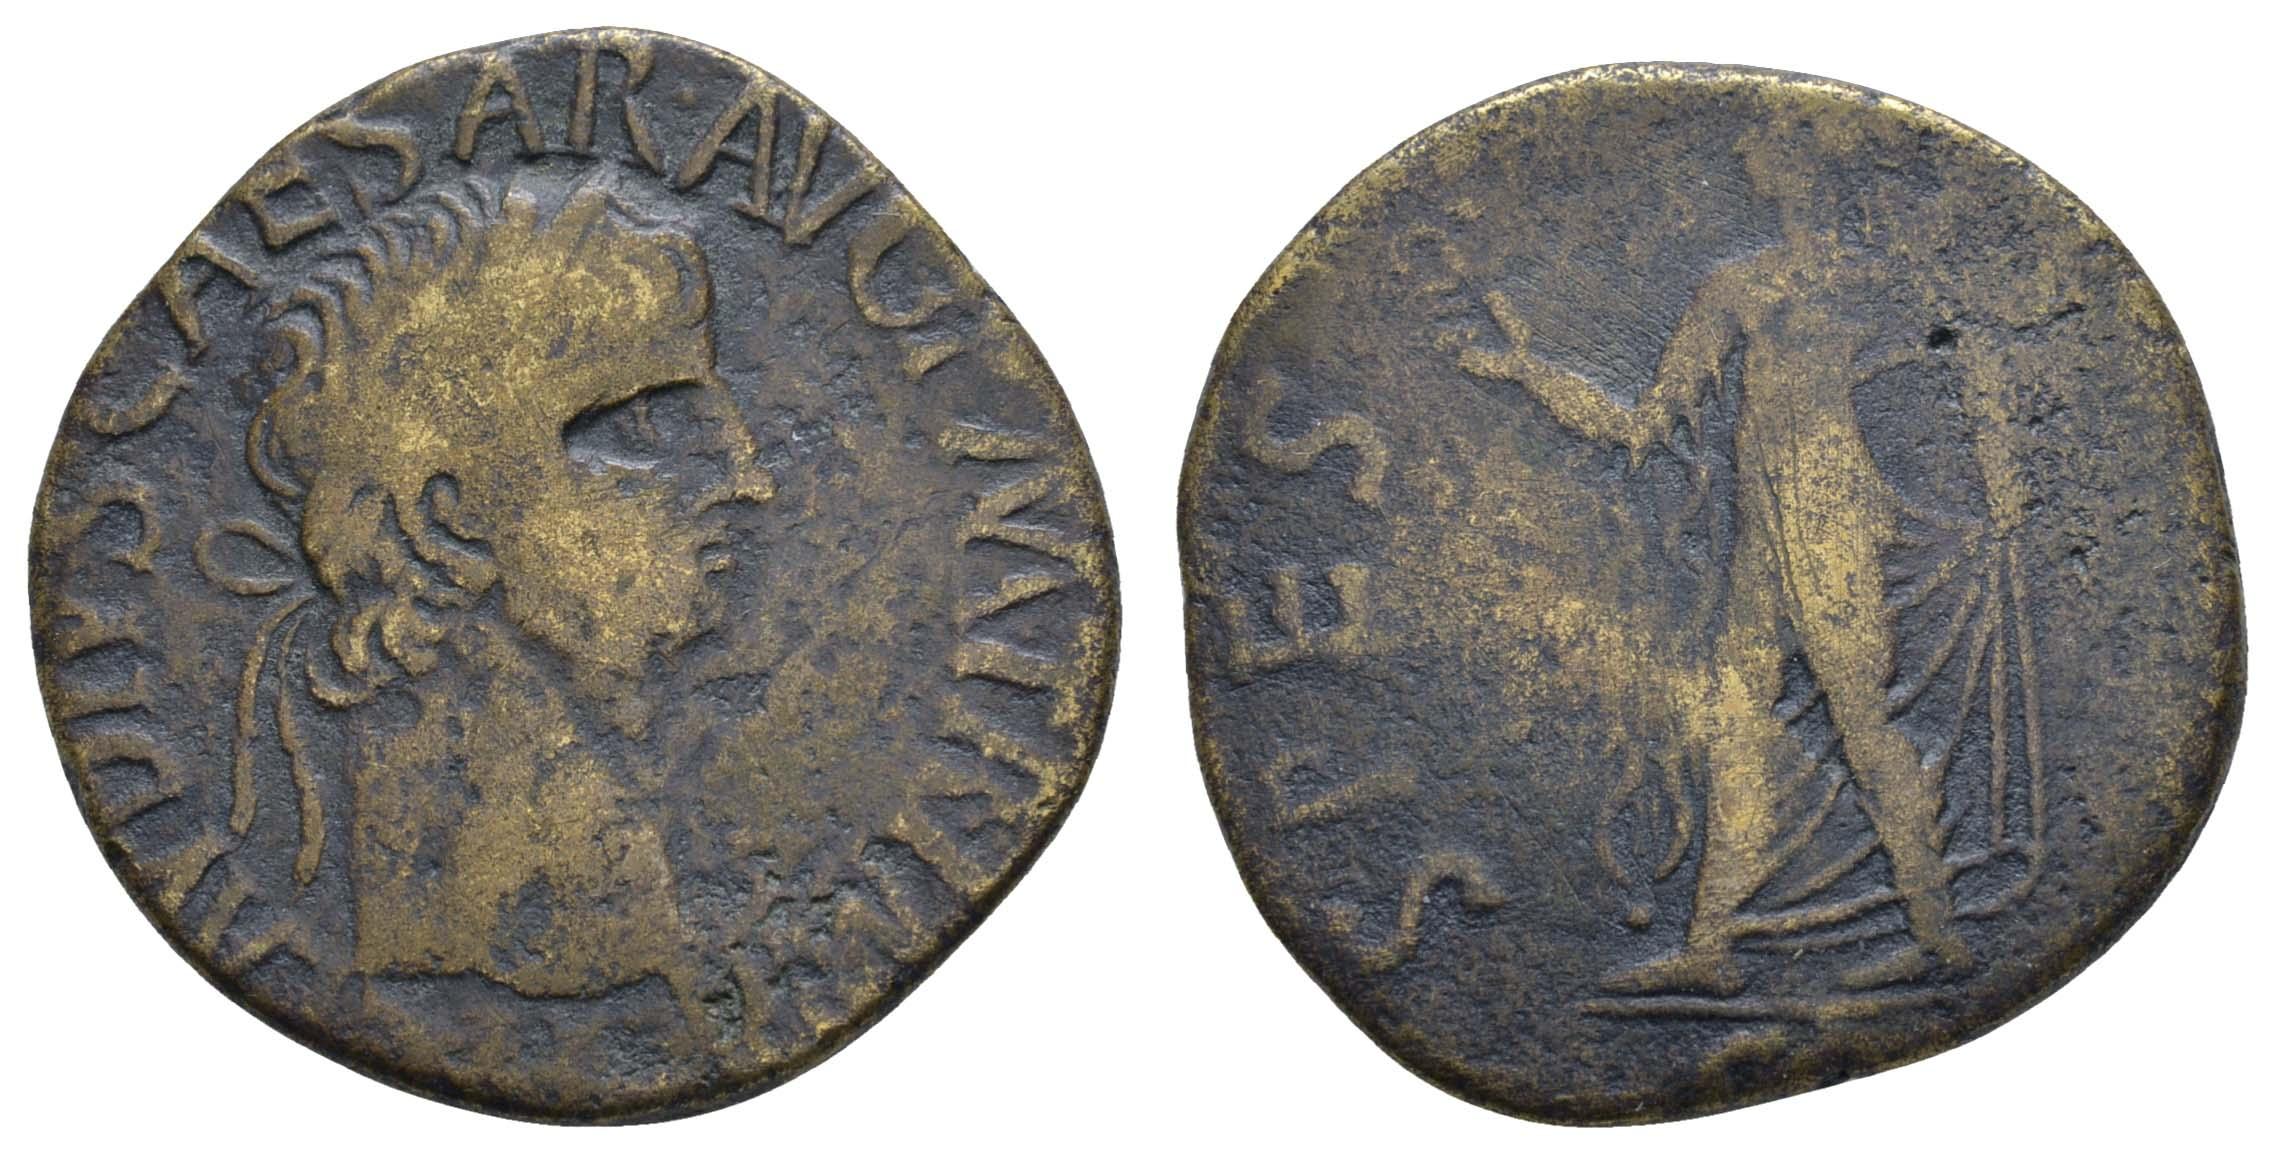 Lot 132 - Antike Römer - Kaiserzeit -  Auktionshaus Ulrich Felzmann GmbH & Co. KG Coins single lots